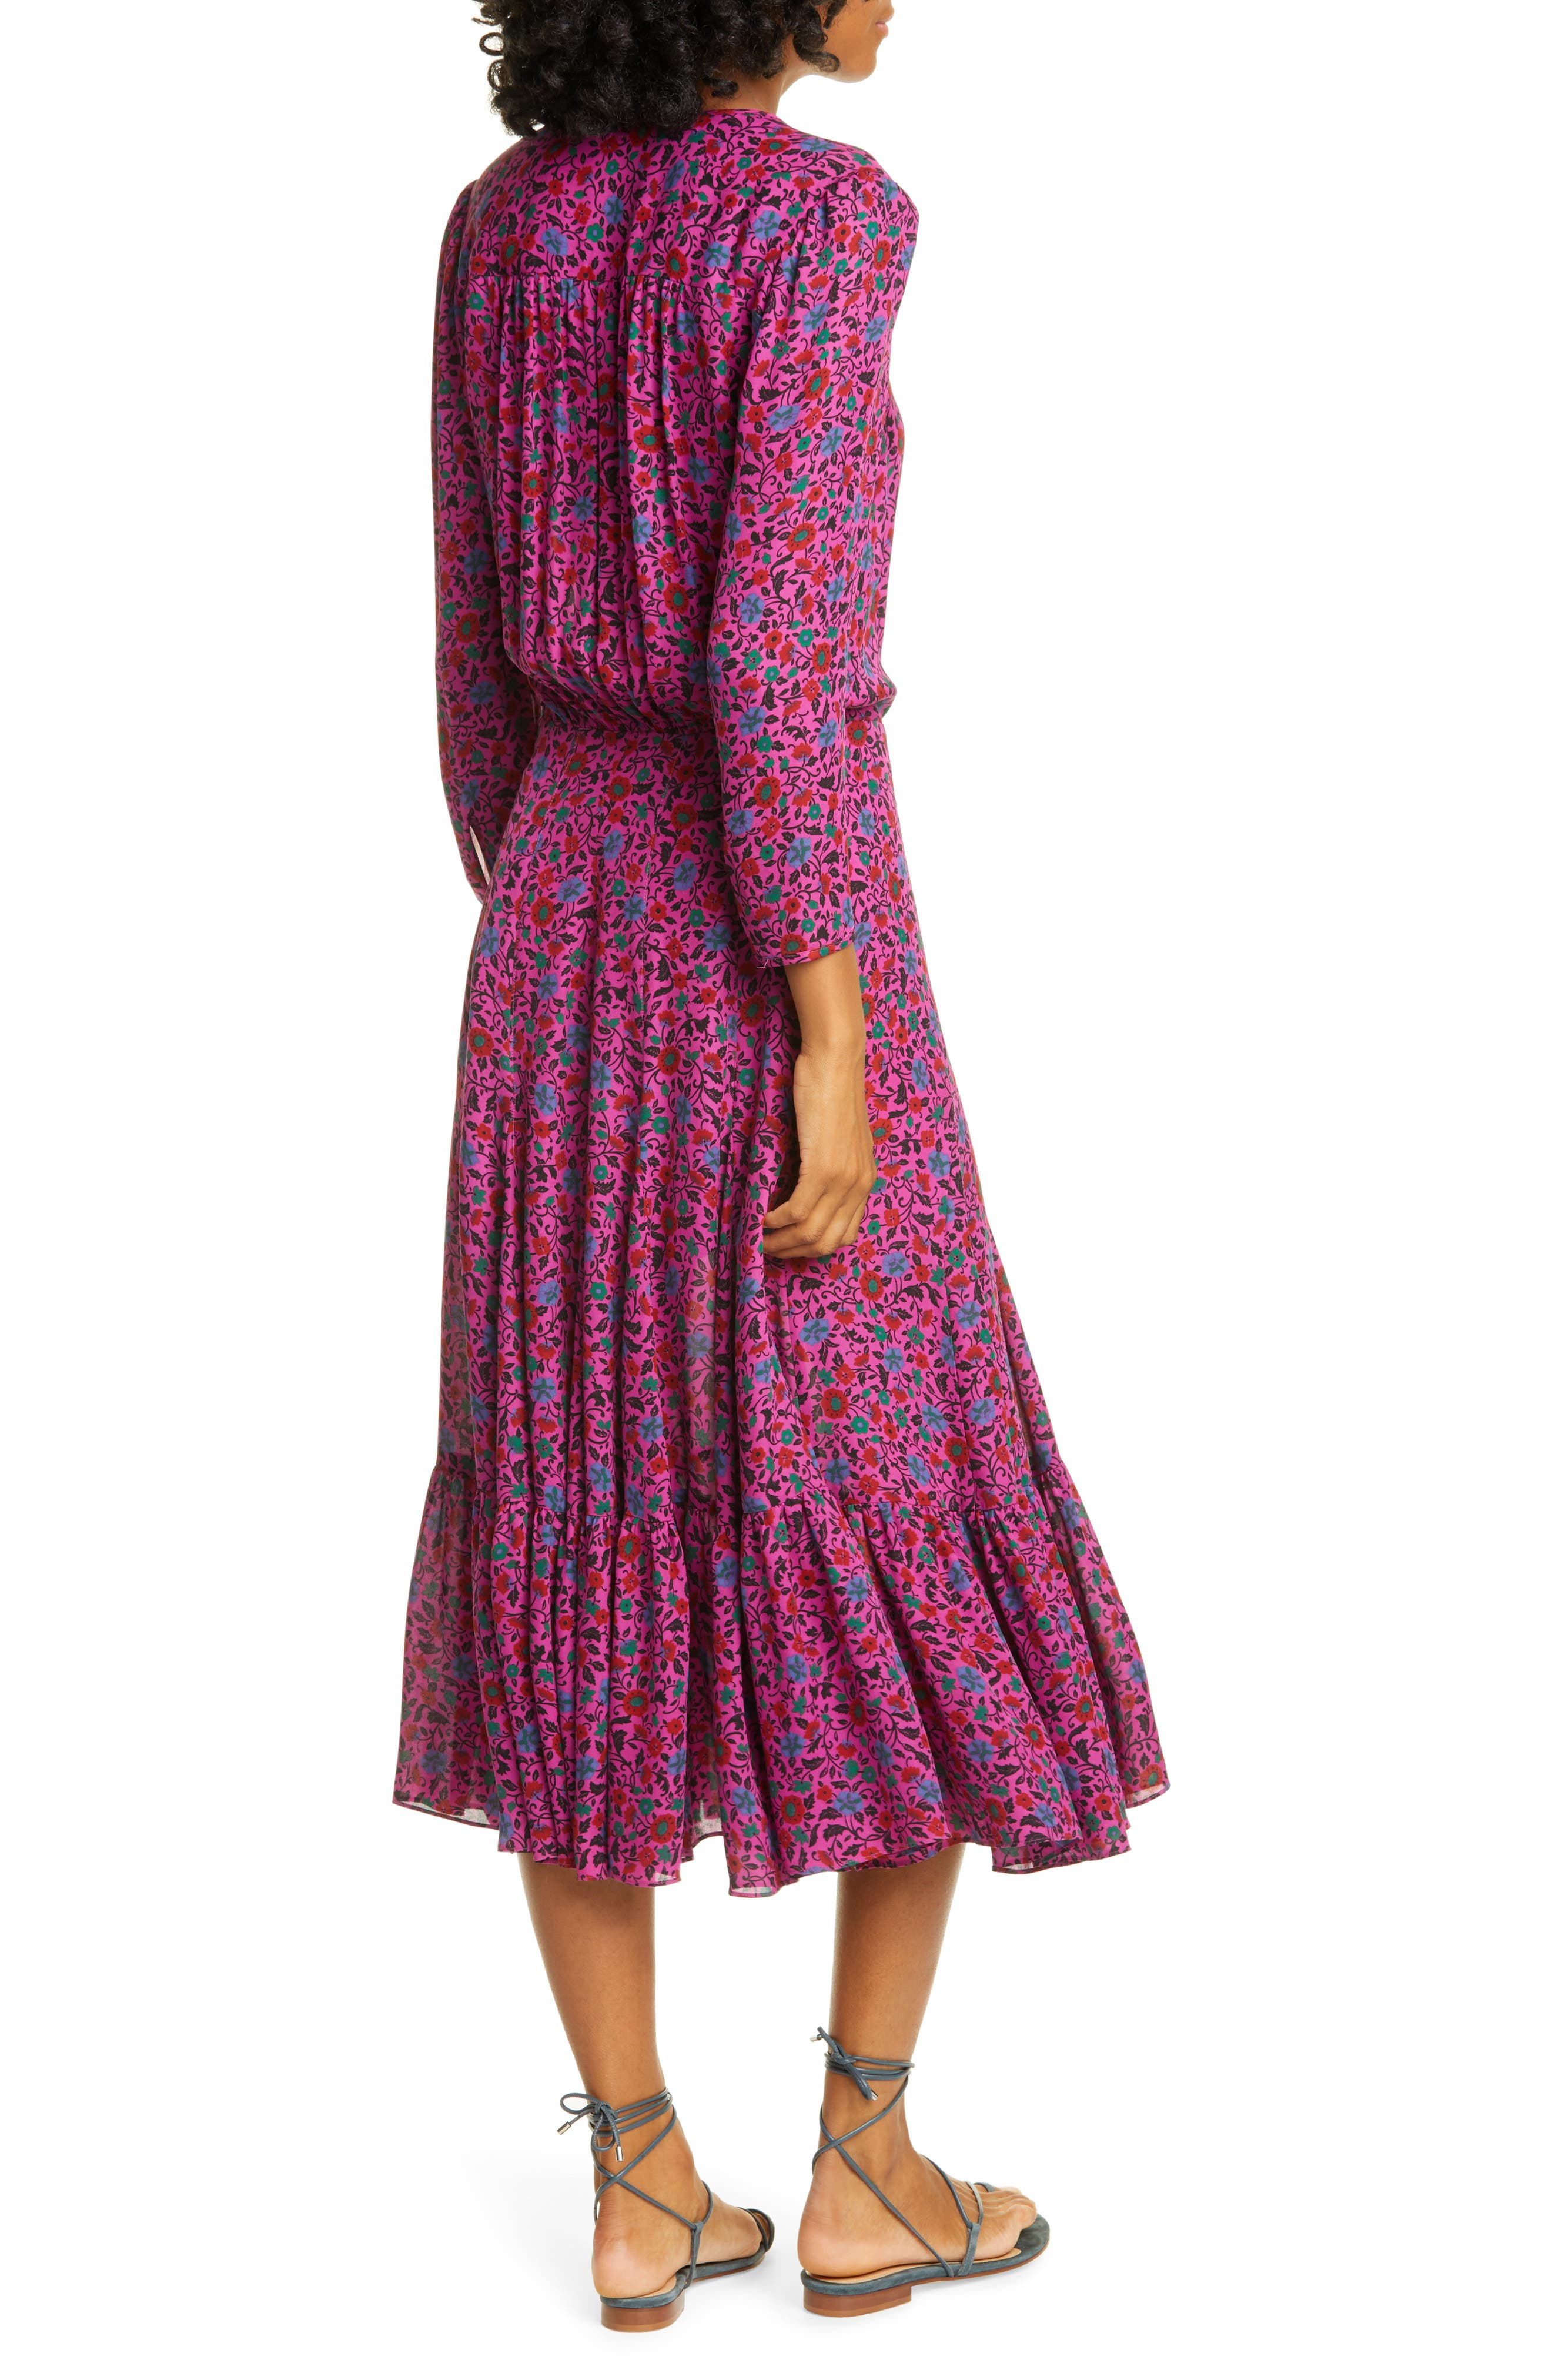 Veronica Beard Dresses Lasanna Floral Silk Dress